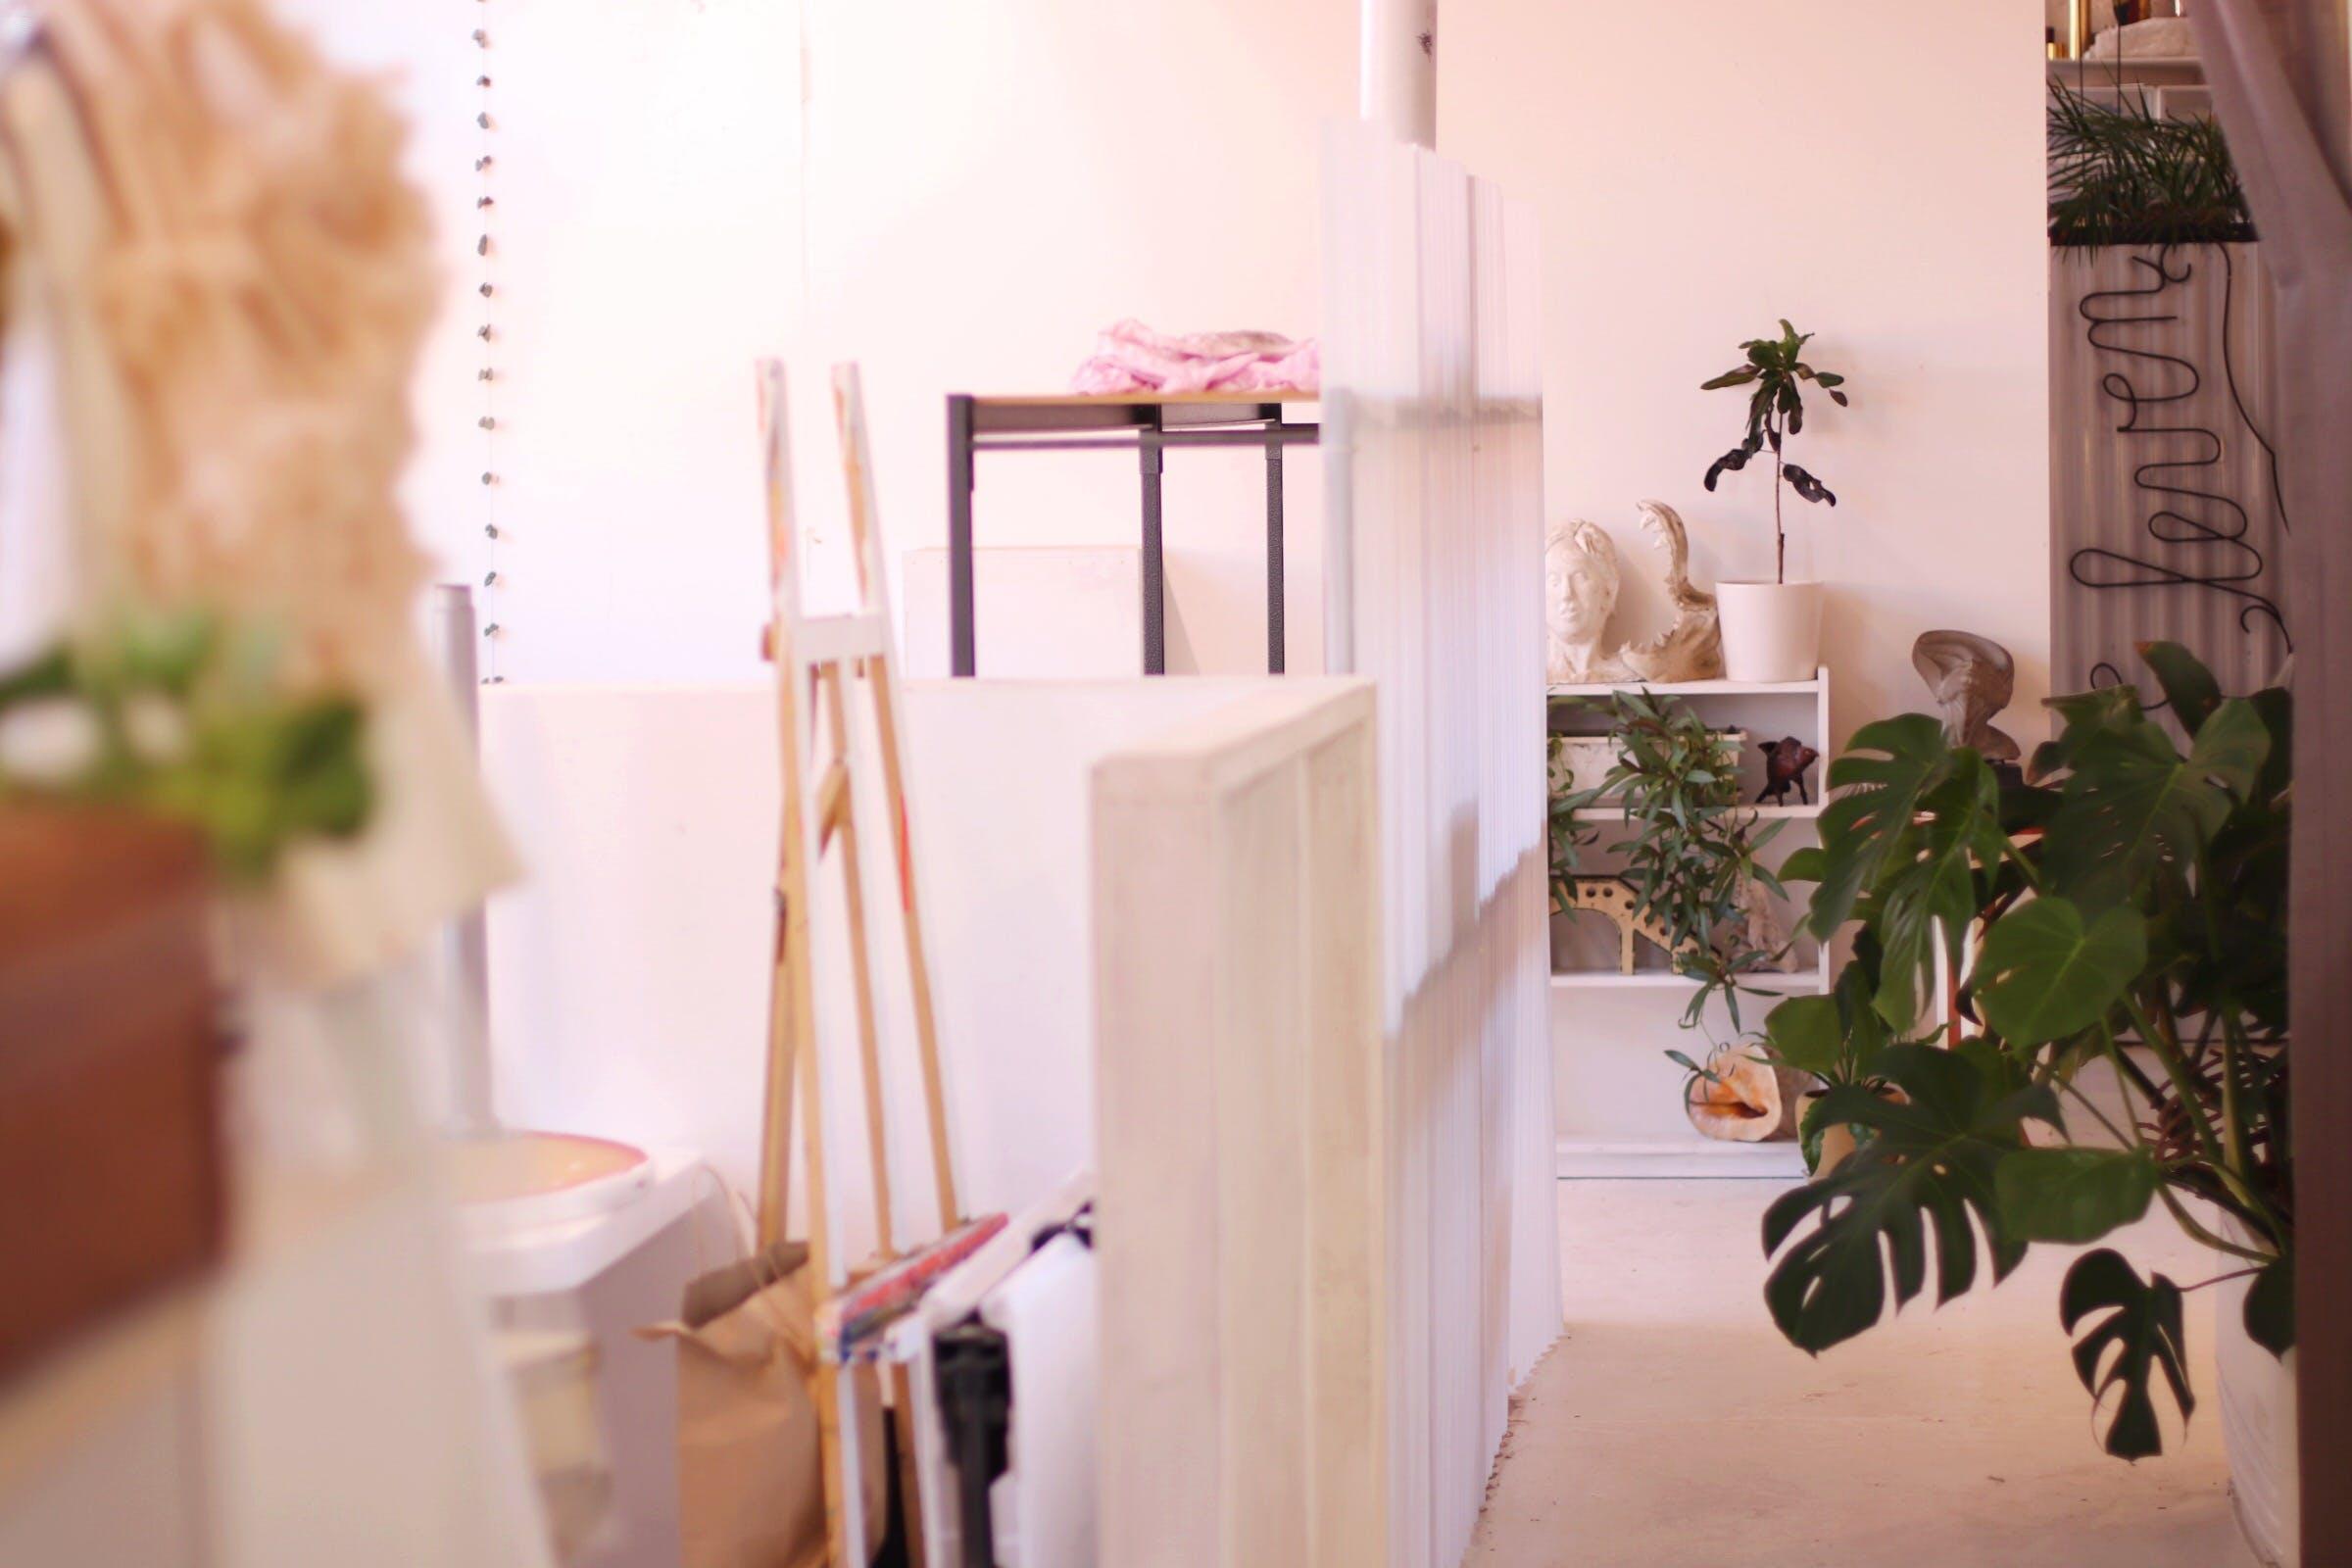 Creative studio at Kerr Street Studios, image 2